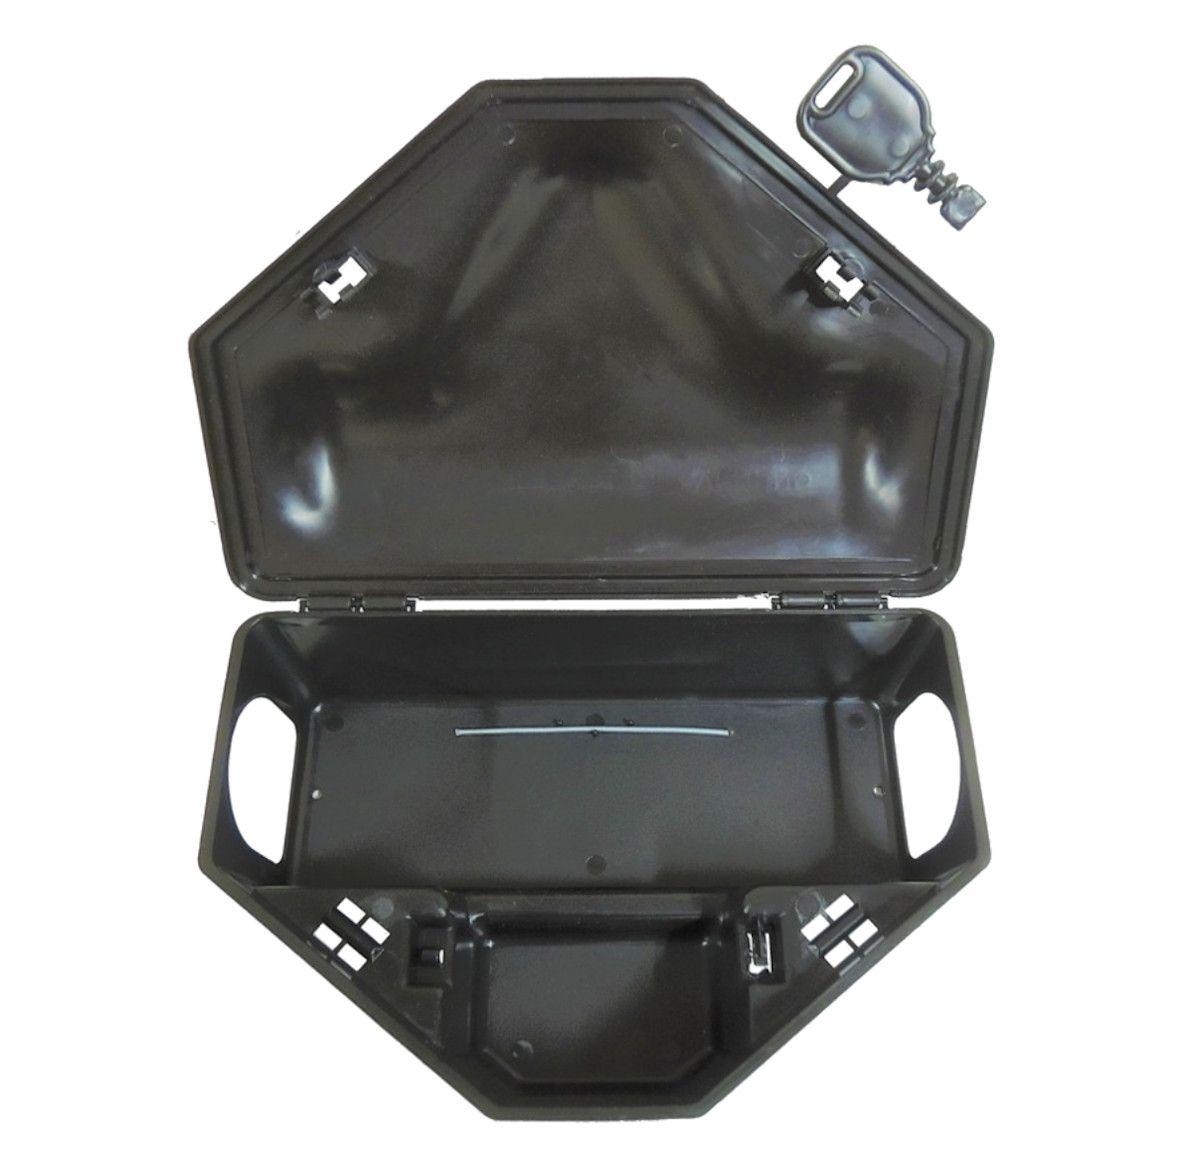 Kit 4 Porta Isca Com Chave Para Ratos